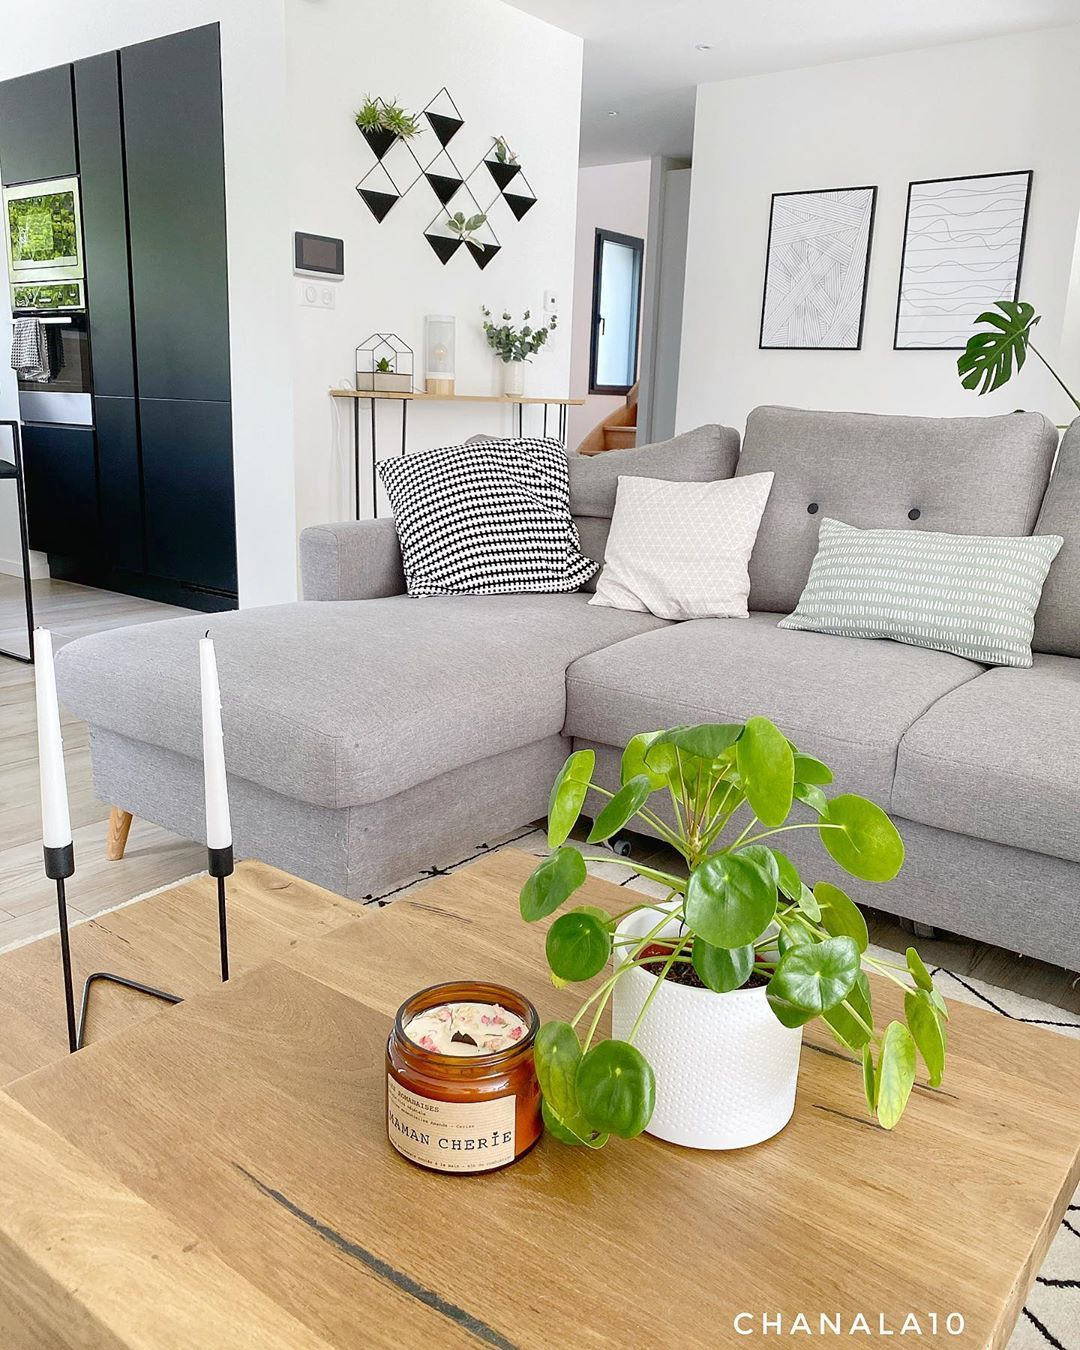 Epingle Sur Deco Scandinave Scandinavian Home Bobochic